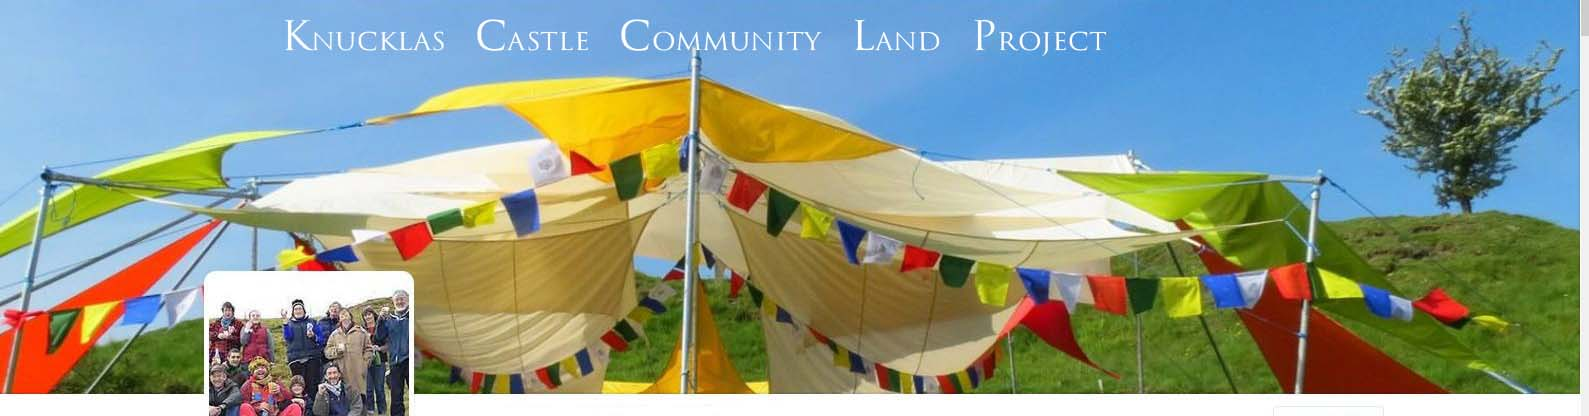 Knucklas Castle Community Land Project